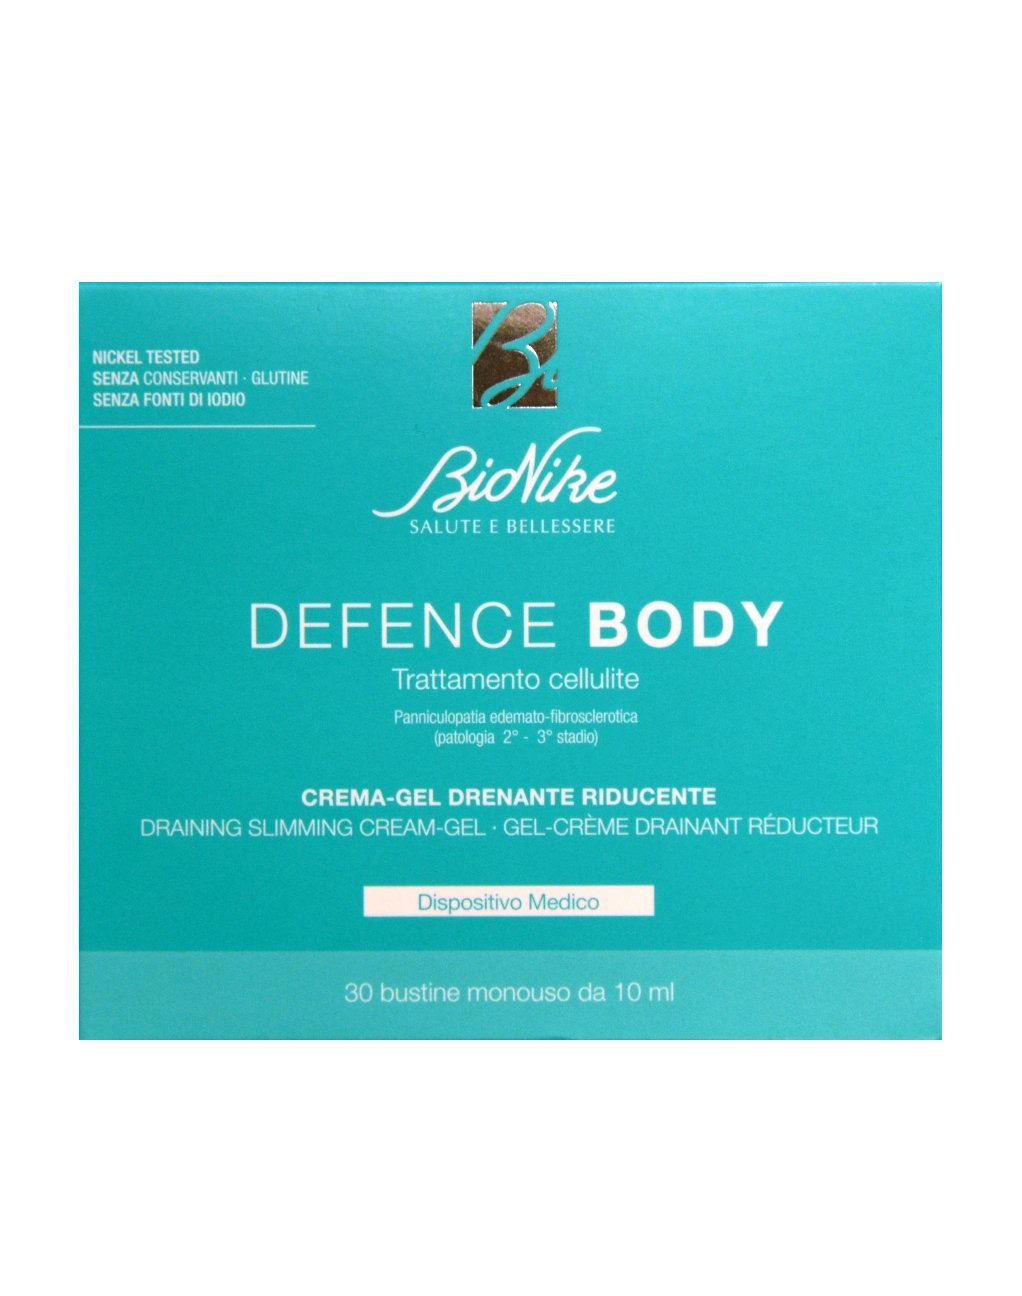 BIONIKE DEFENCE - BODY ANTICELLULITE CREMA-GEL DRENANTE RIDUCENTE